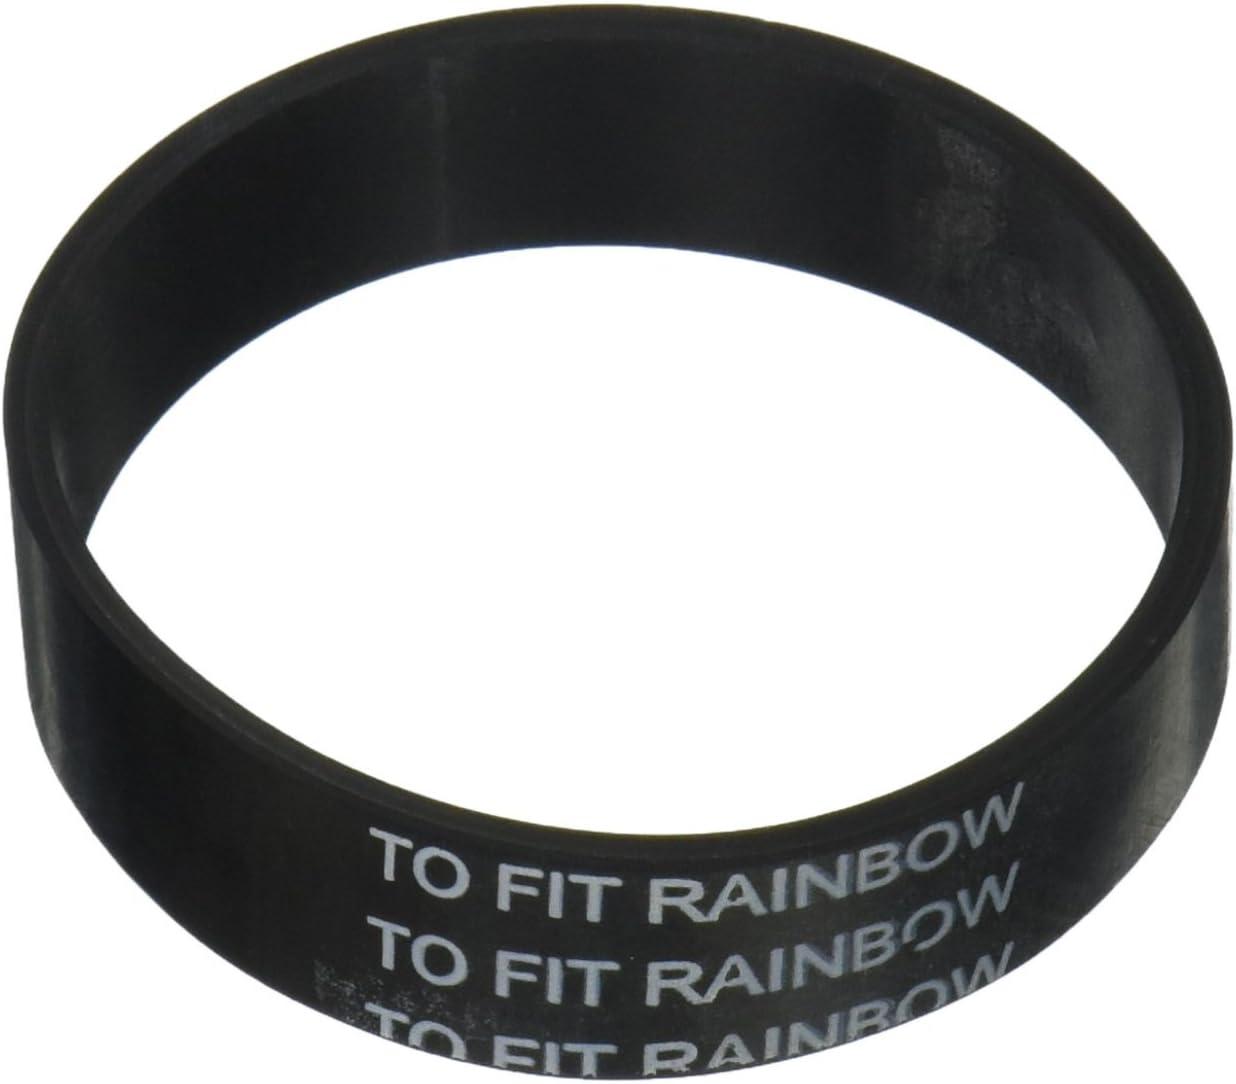 Vac Belts Rainbow Belt for All Rainbow Models [Misc.]